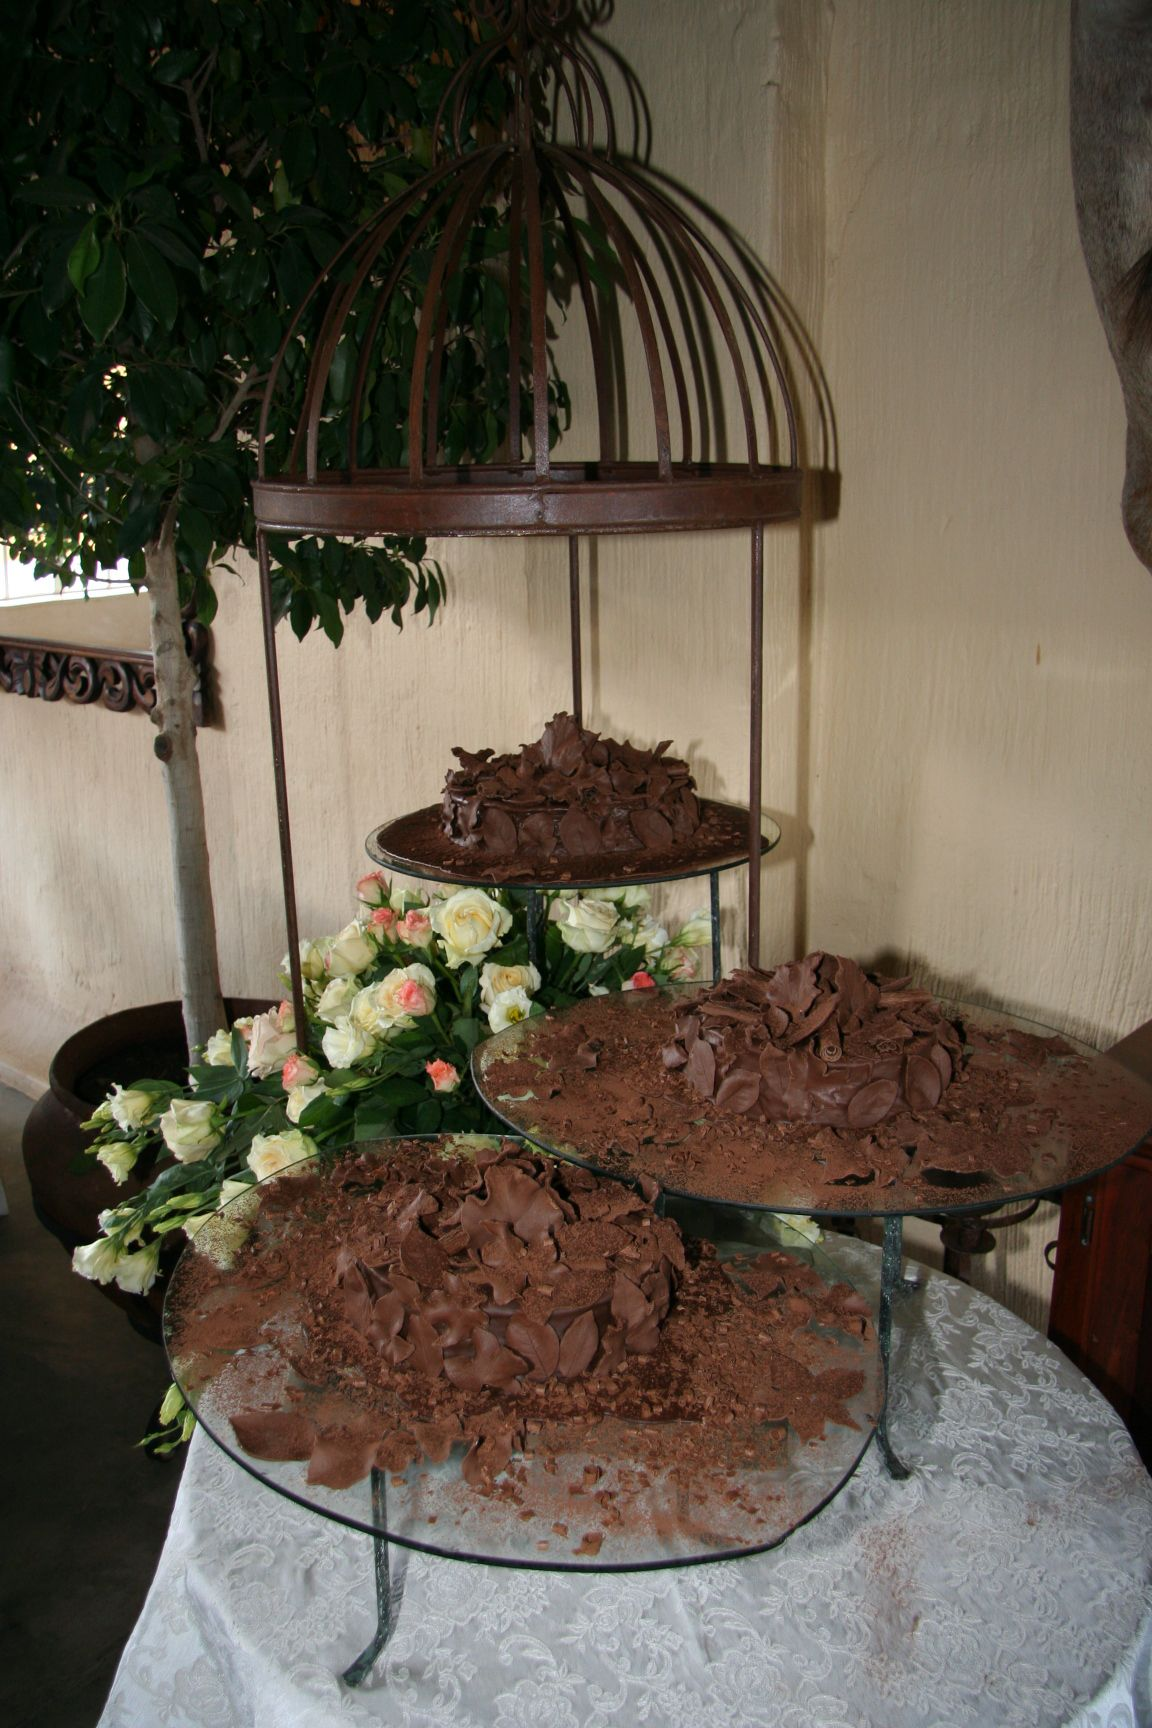 It's a sweet day with a #Chocolate #Cake www.thabatshwene.co.za